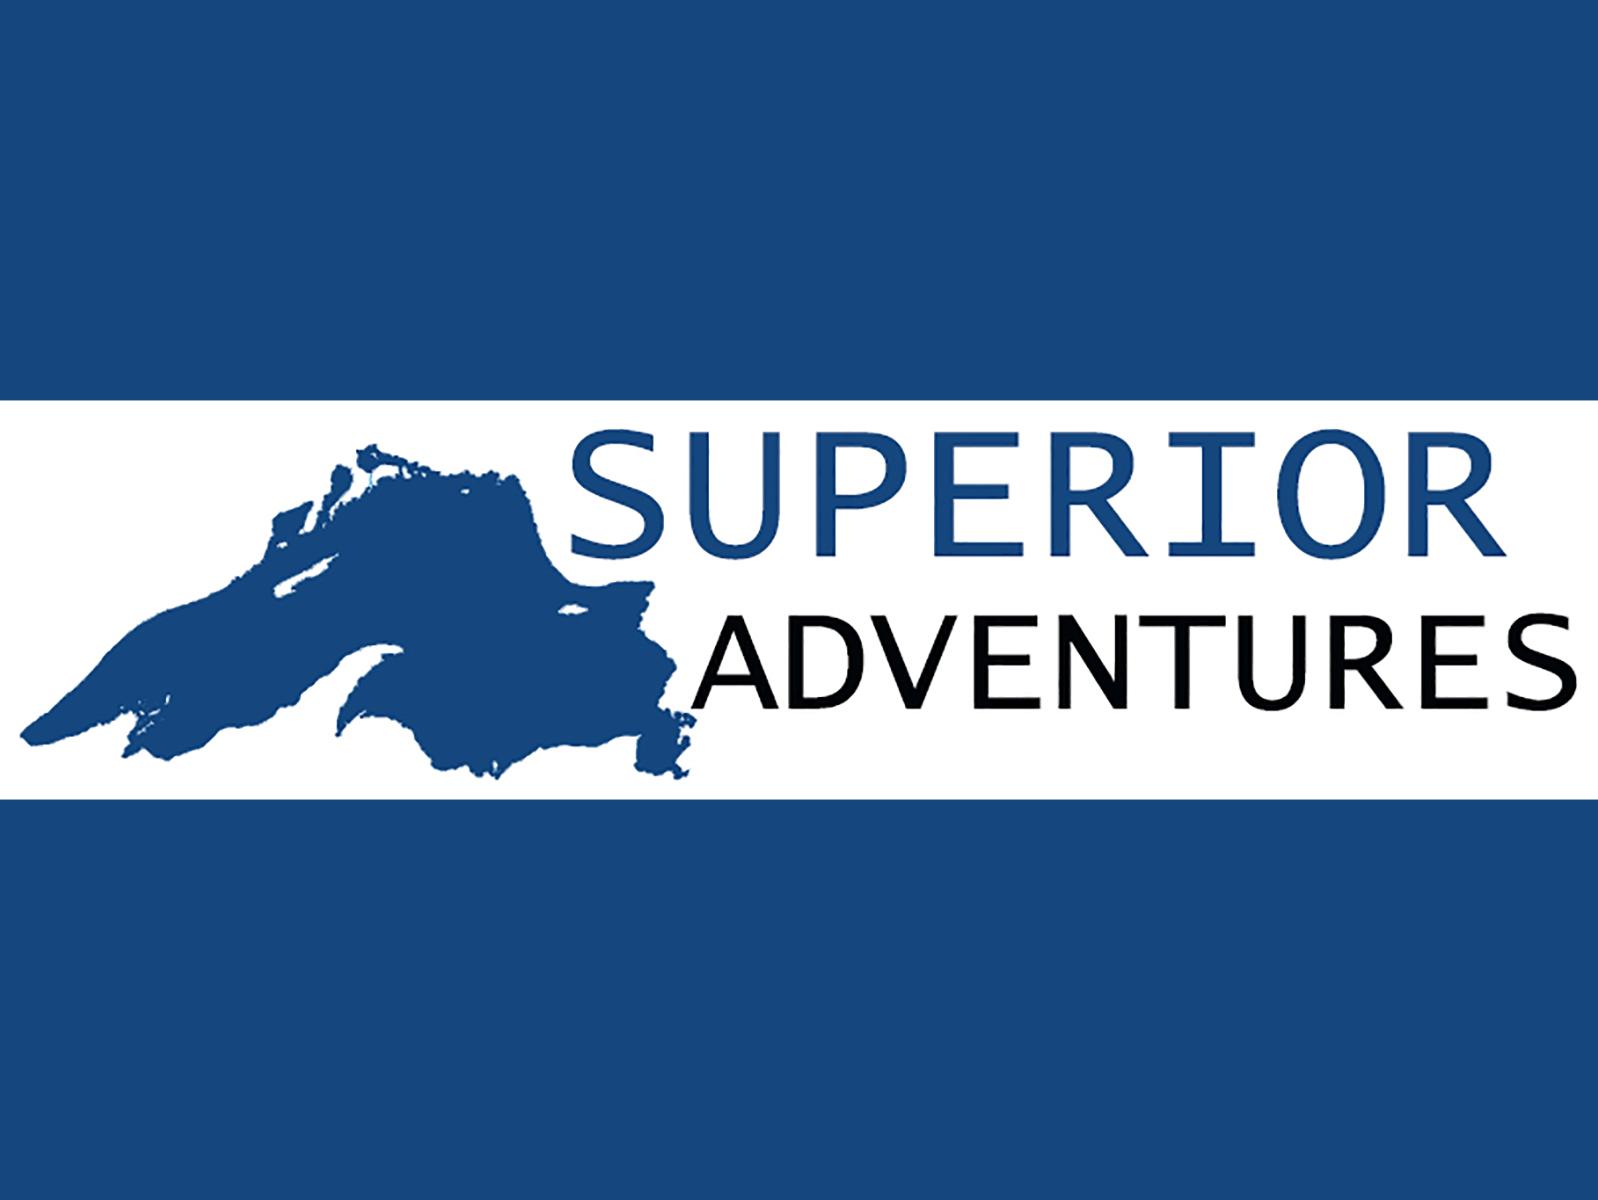 Superior Adventures Logo with blue